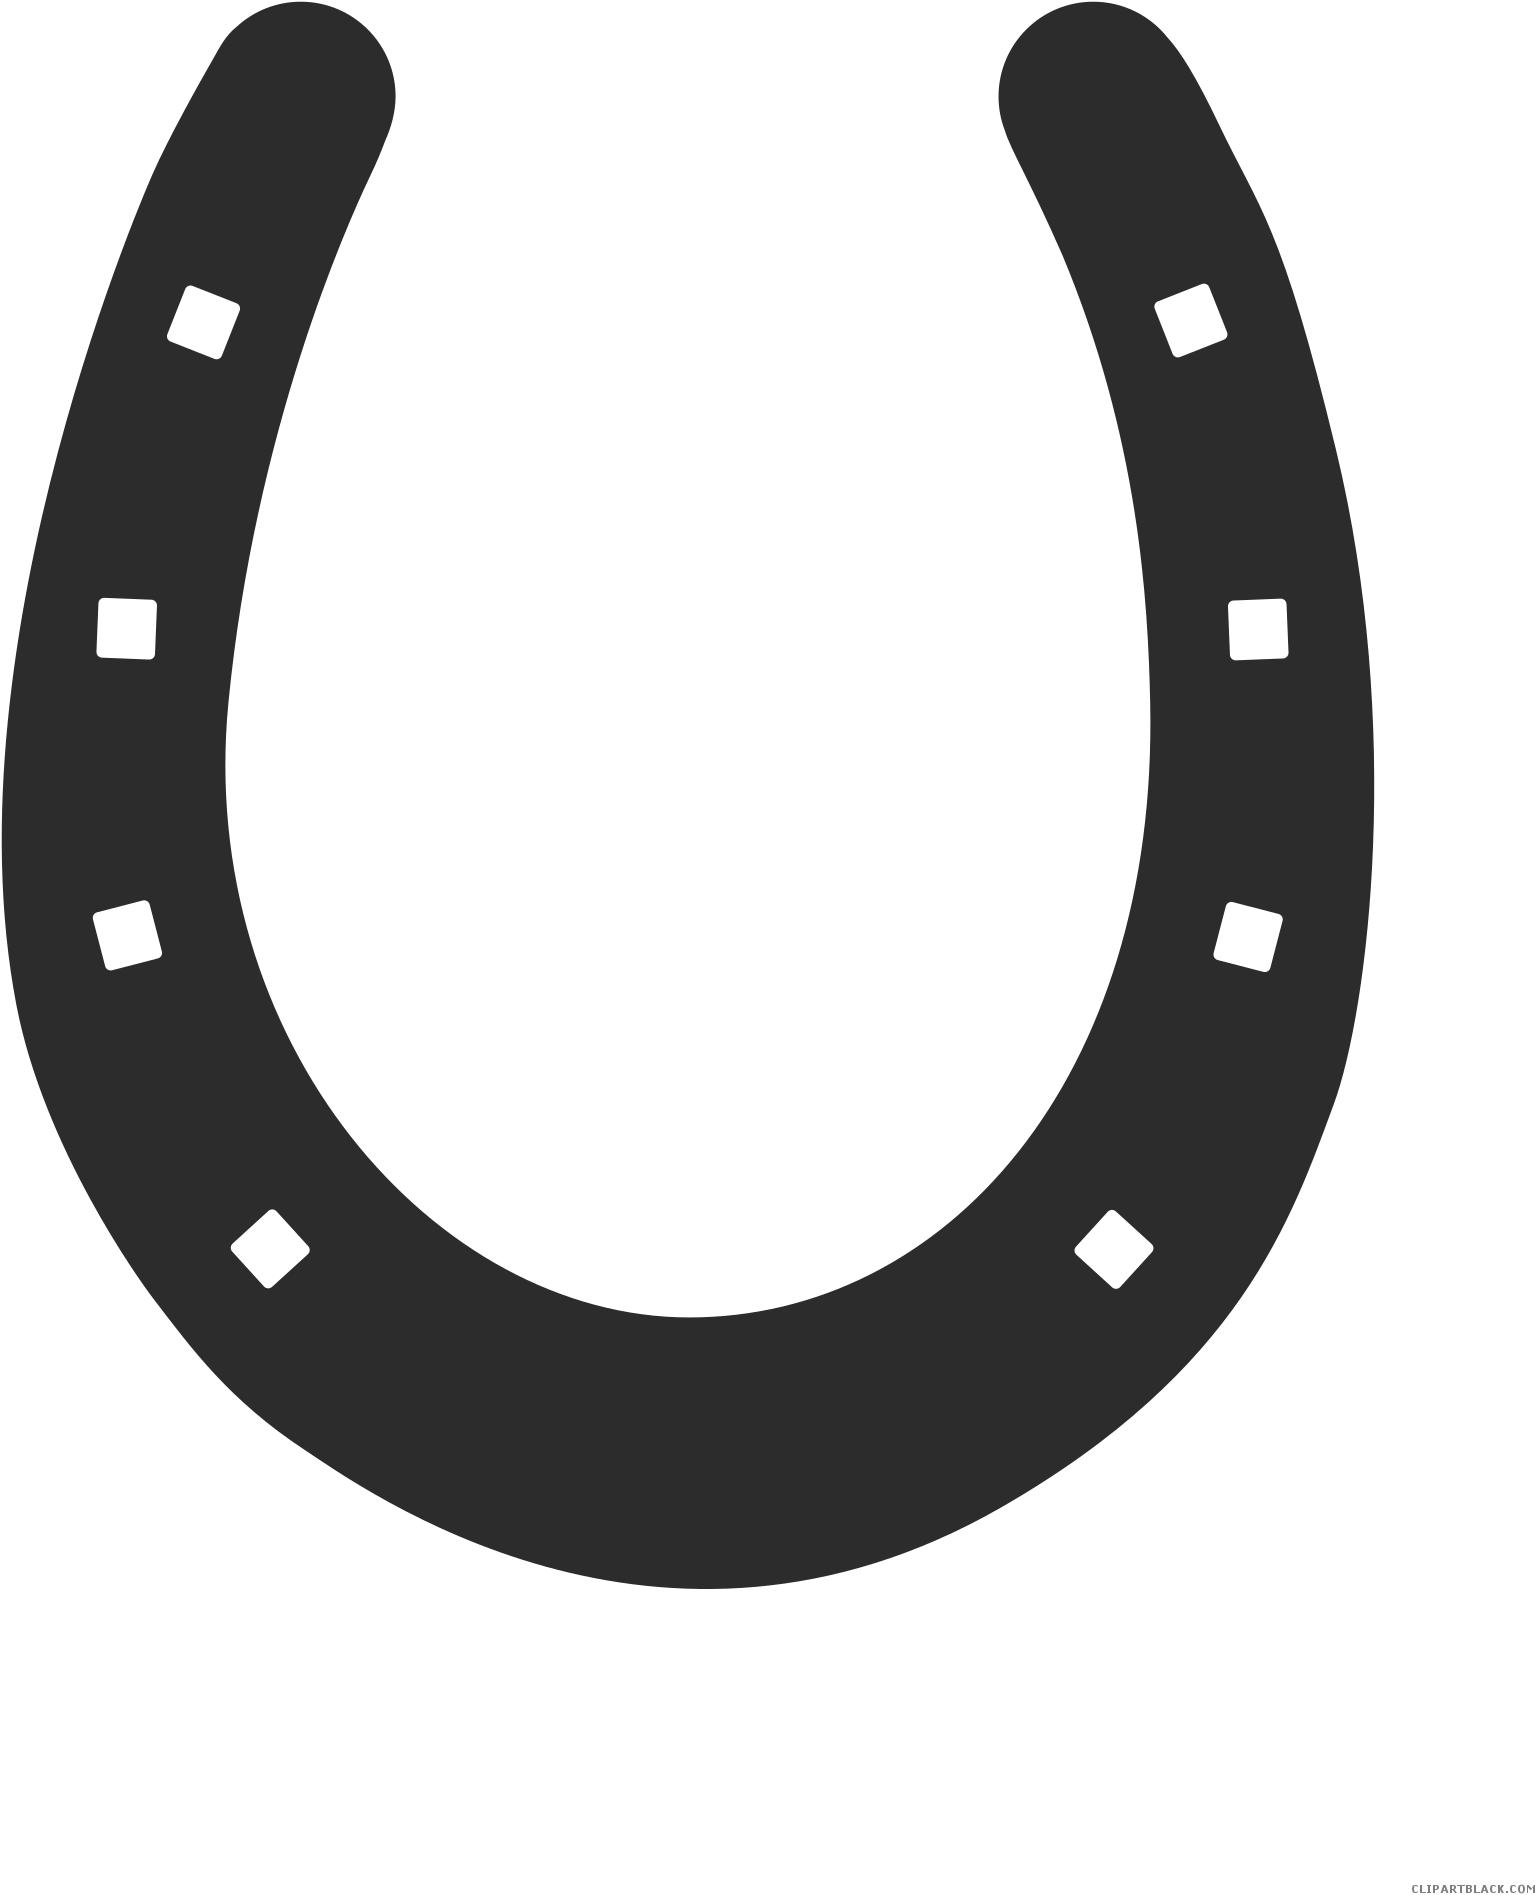 Horseshoe Clipart Transparent.